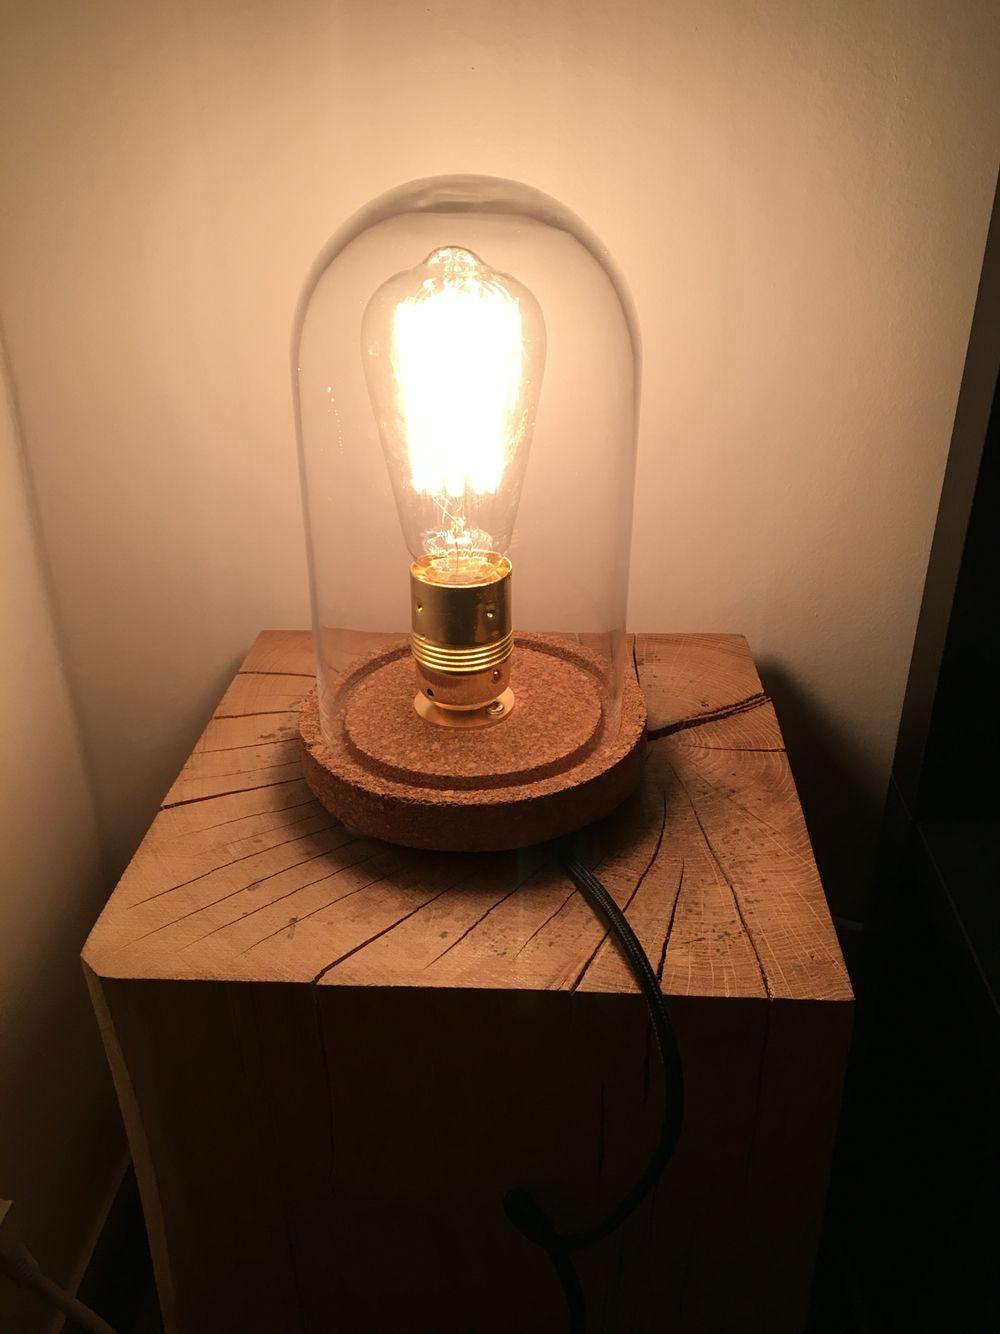 Lampe Sous Cloche lampe sous cloche | lampy | pinterest